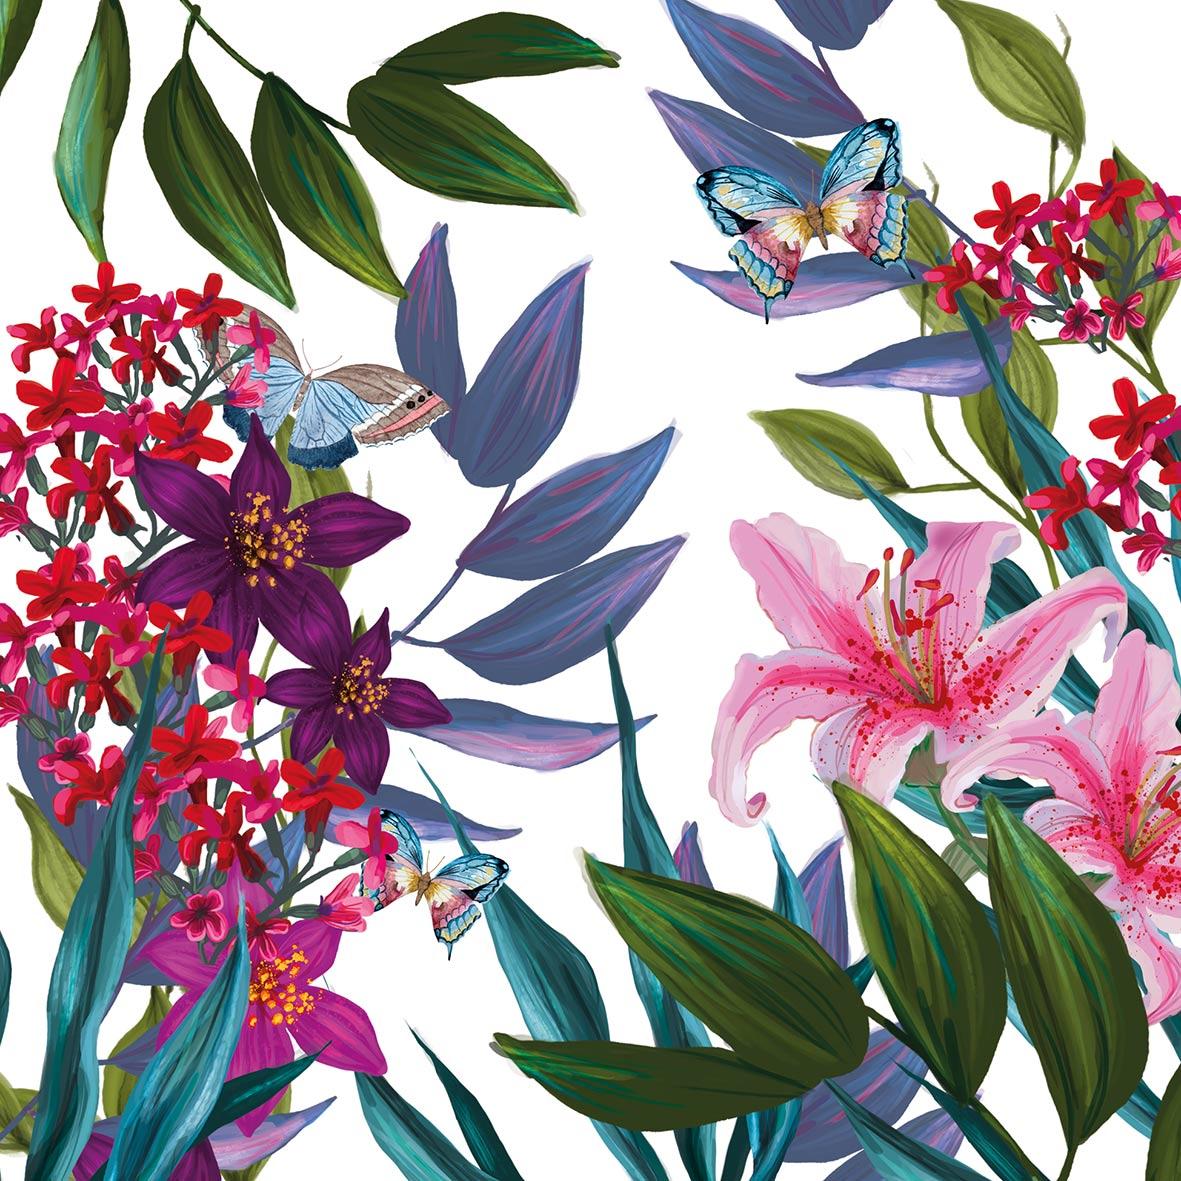 Tropical Lilies 25x25 cm